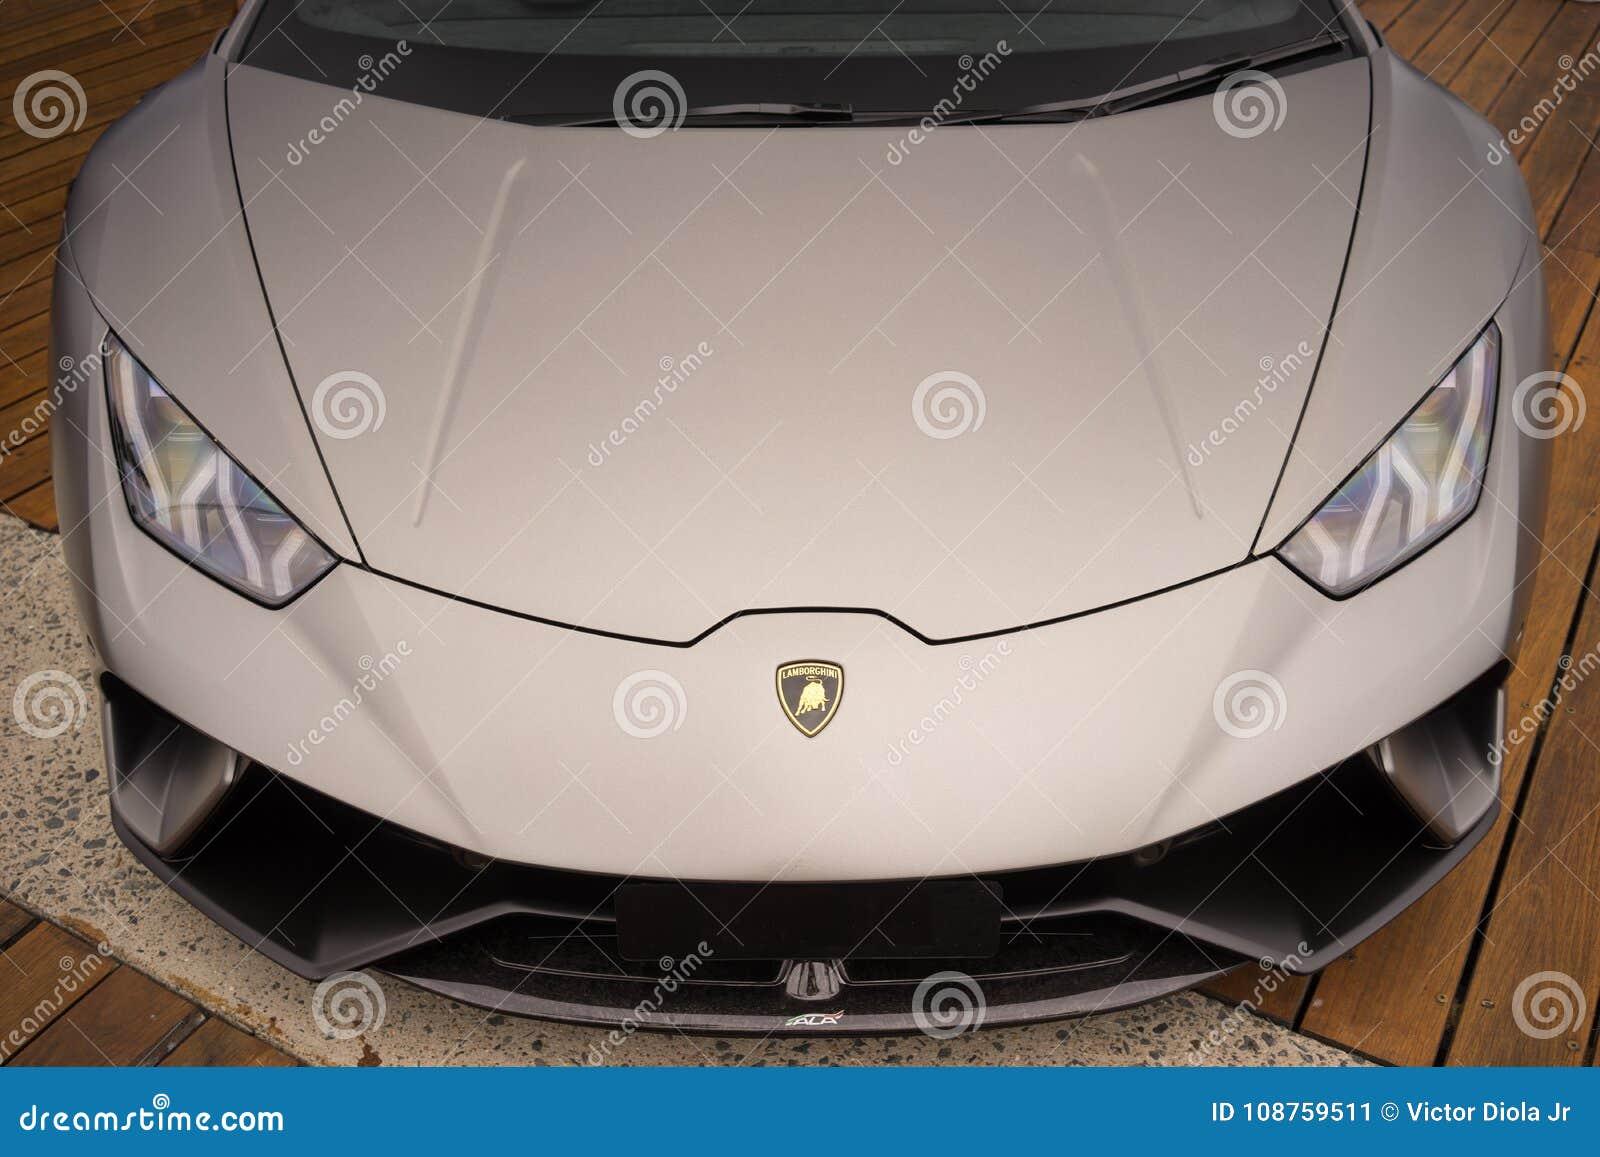 Lamborghini Sports Car Front View Editorial Photo Image Of Italian